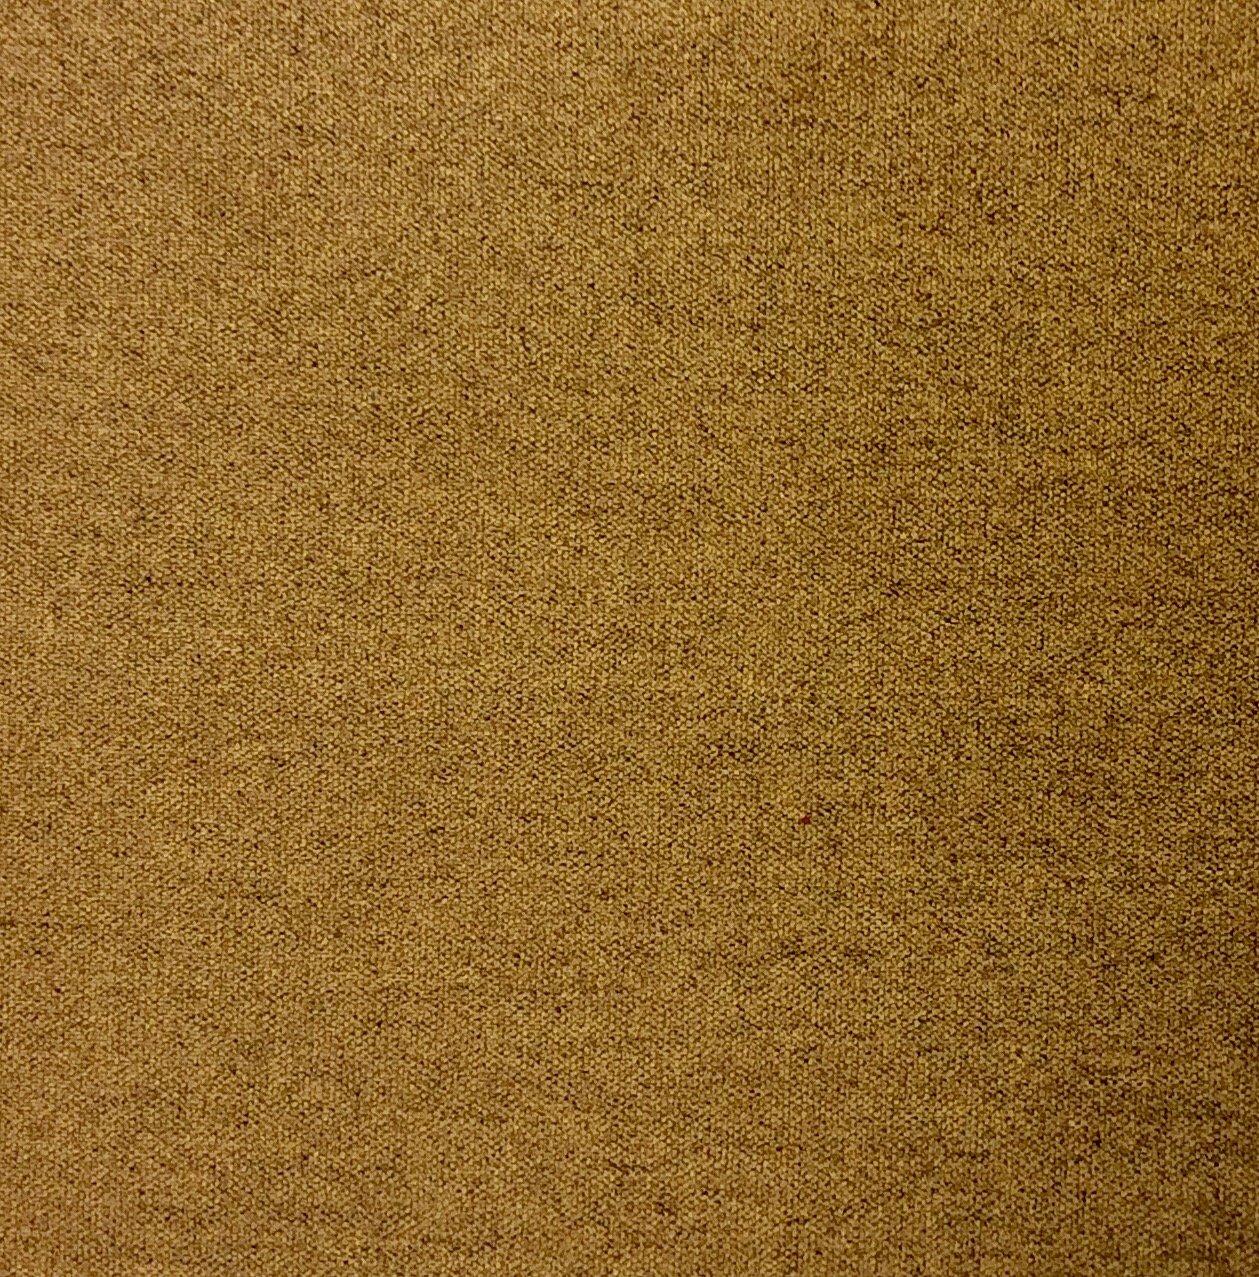 Golden Wheat Chenille Upholstery Fabric LAT001